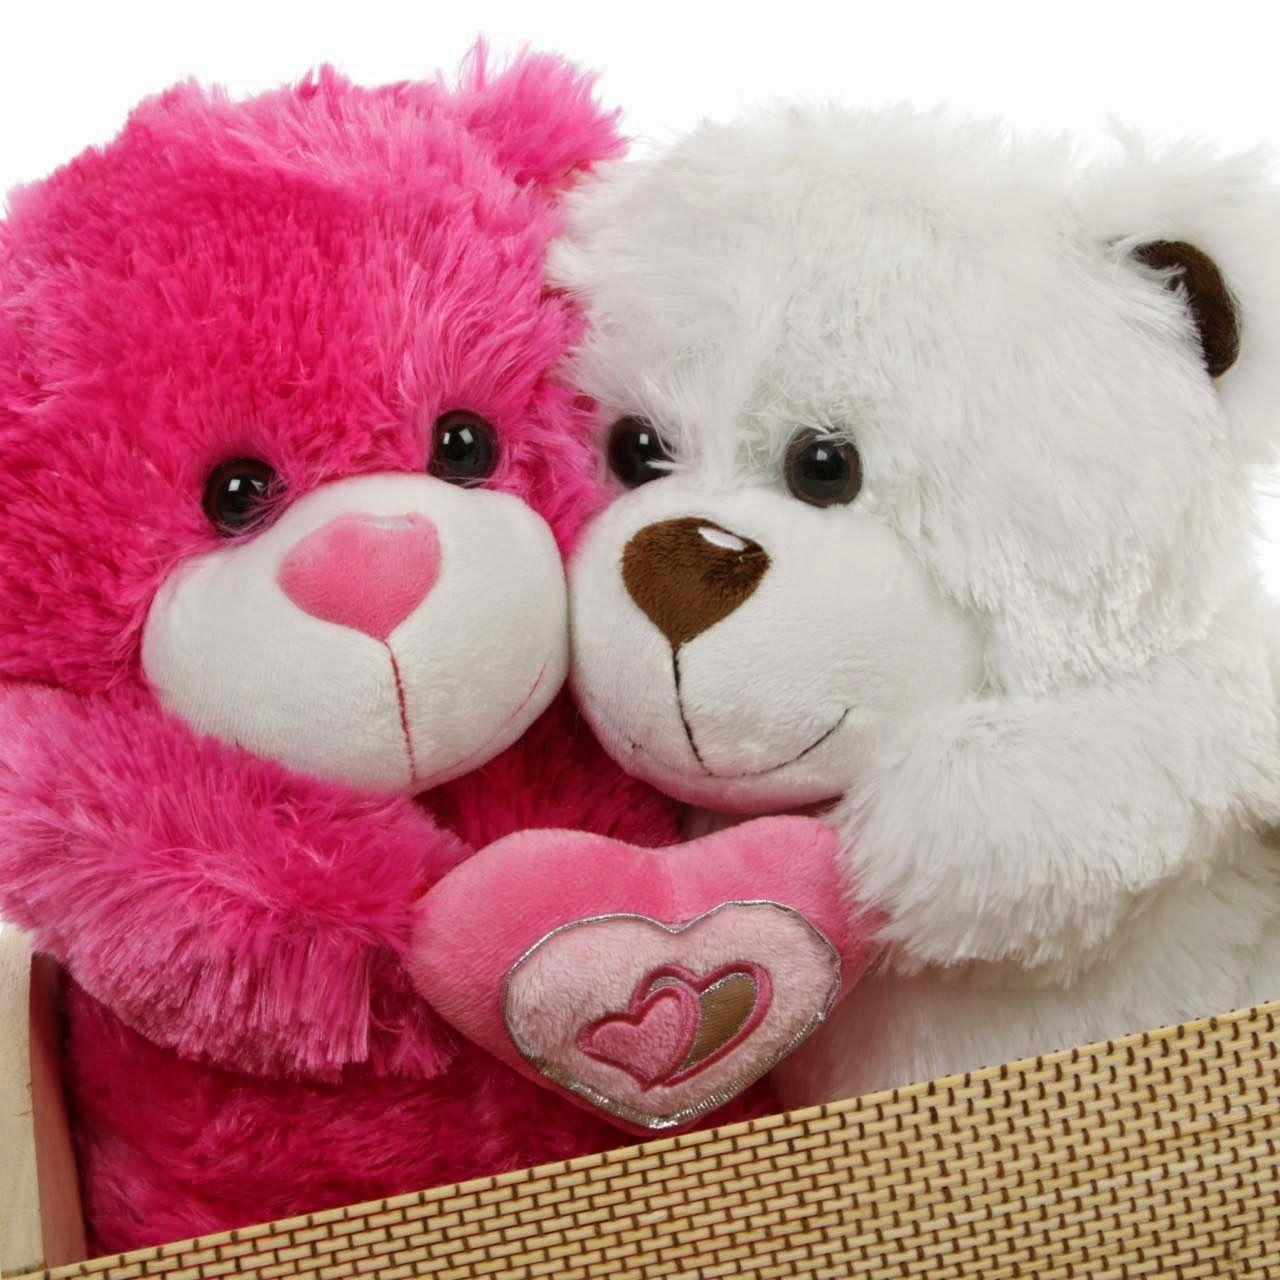 Beautiful Wallpaper Mobile Teddy Bear - 3b6b375665472f447b65ad6ee2c7b458  You Should Have_51875.jpg